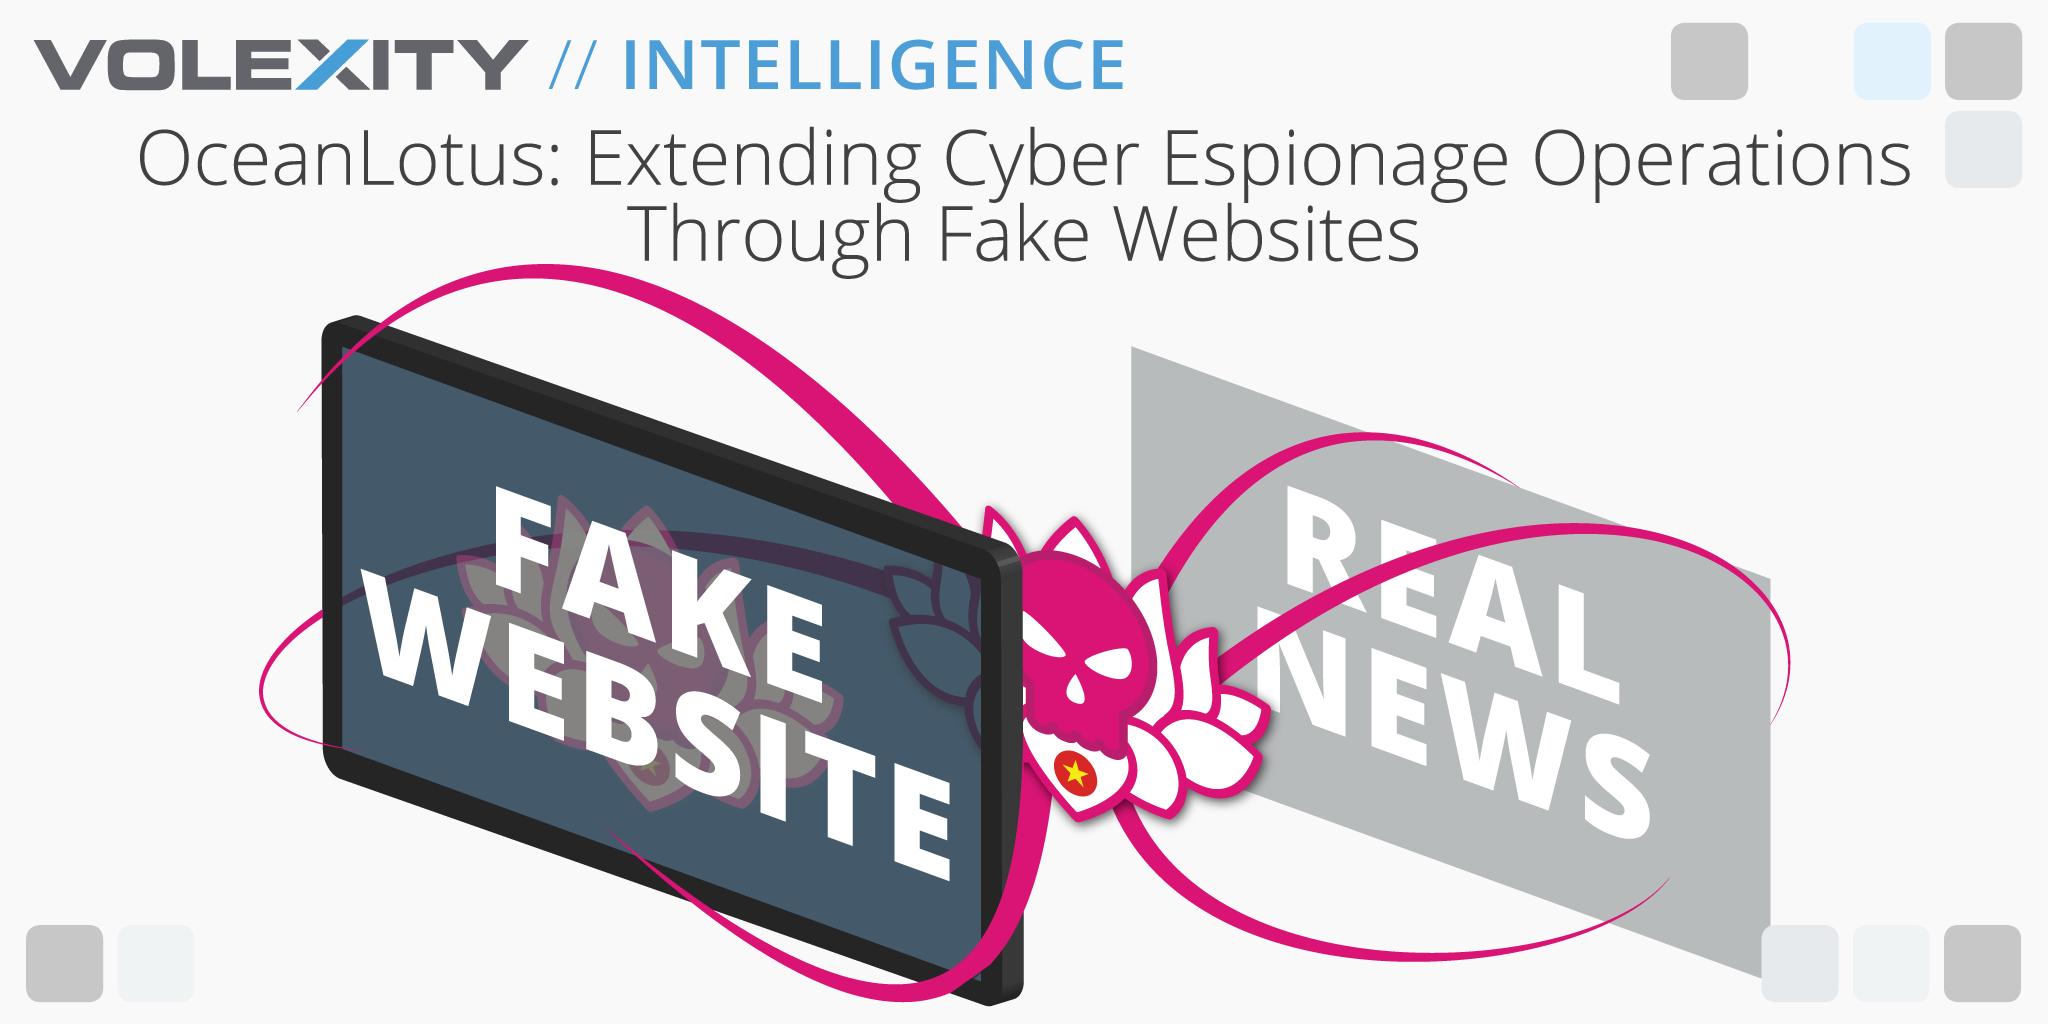 OceanLotus: Extending Cyber Espionage Operations Through Fake Websites